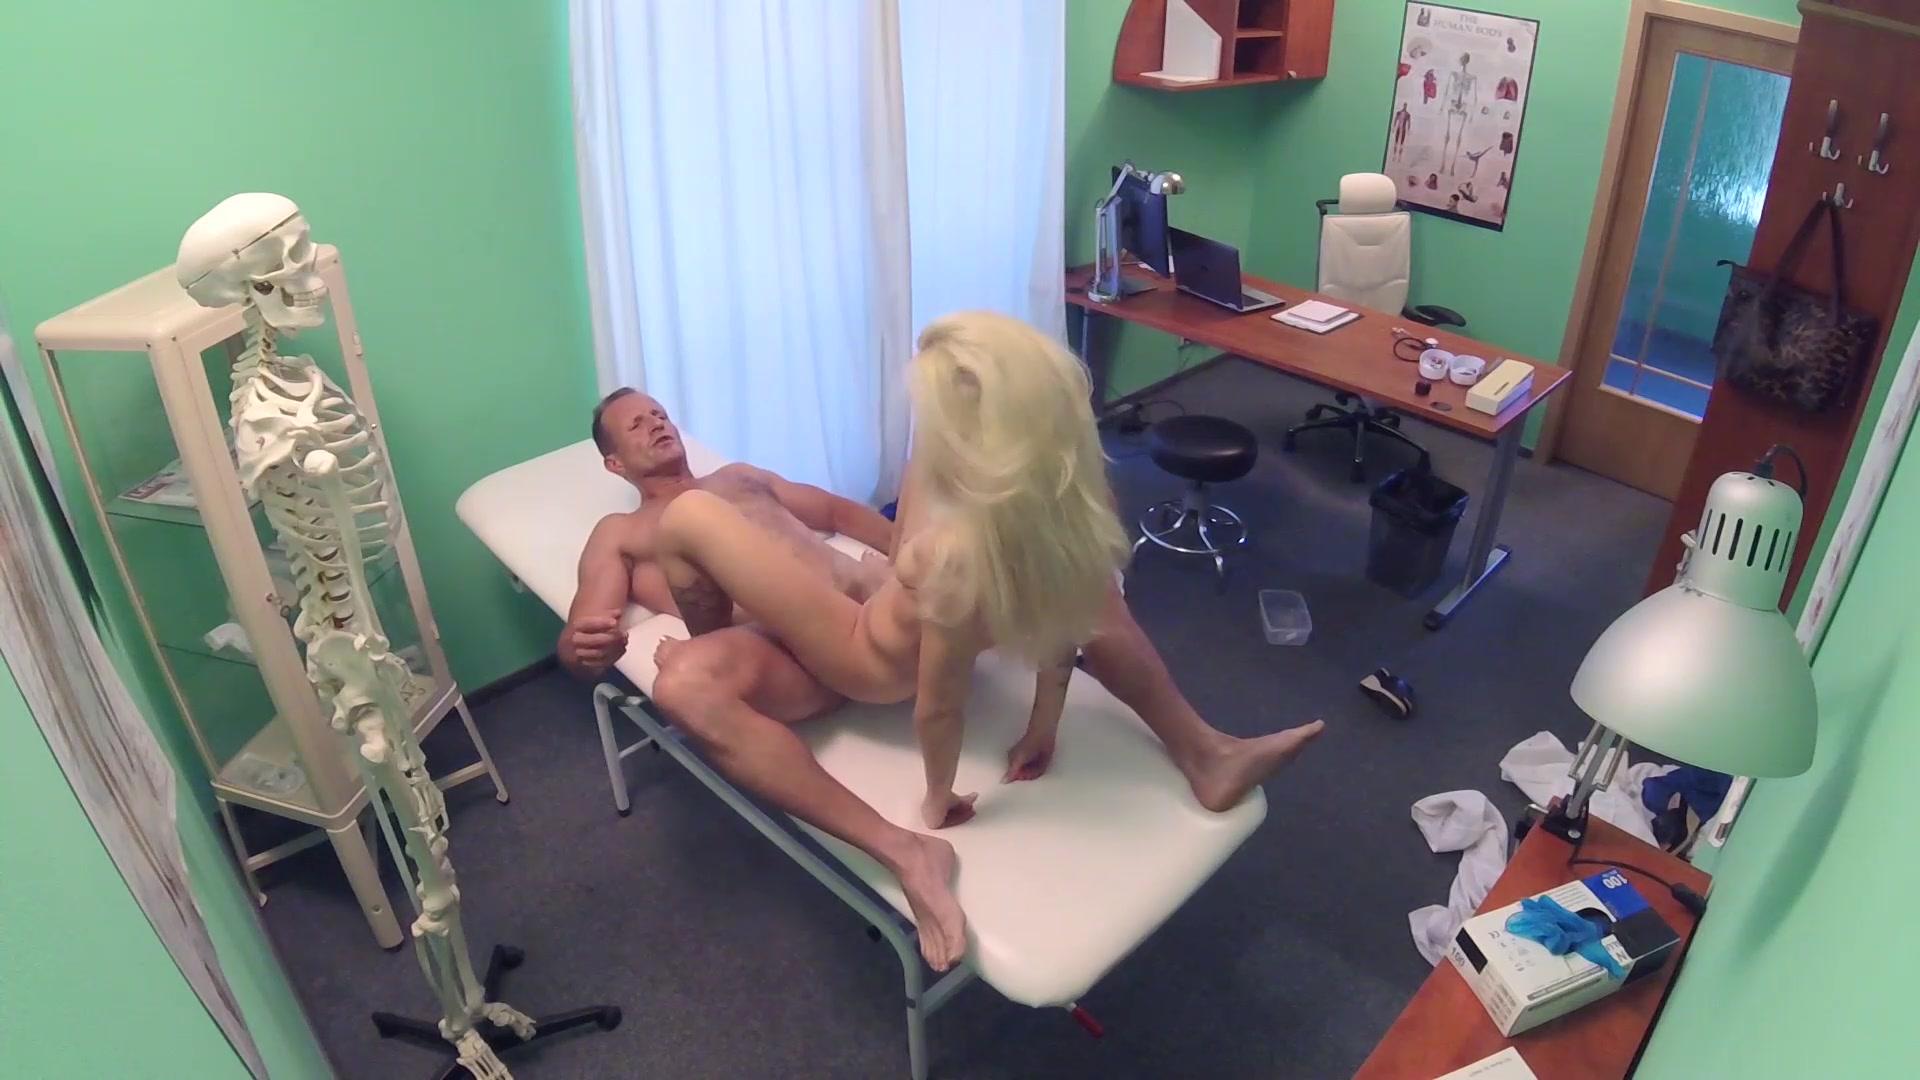 Barbara Bieber & Valerie Fox Porn private examination | fake hospital | unlimited streaming at